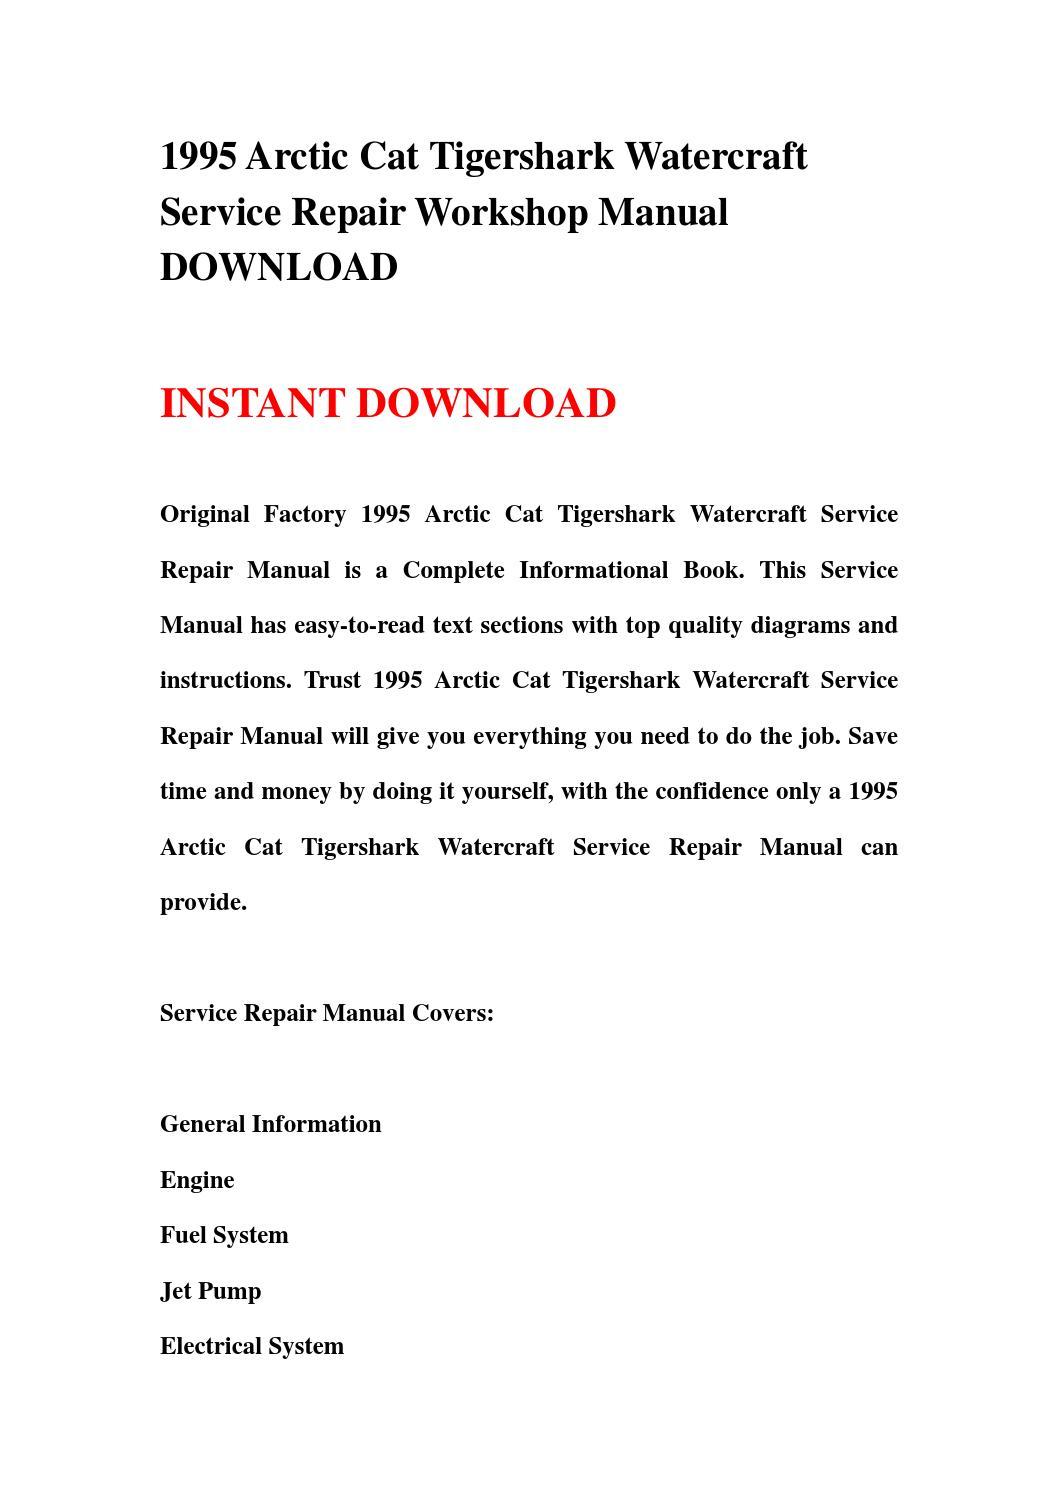 1995 arctic cat tigershark watercraft service repair workshop manual  download by nihuai - issuu